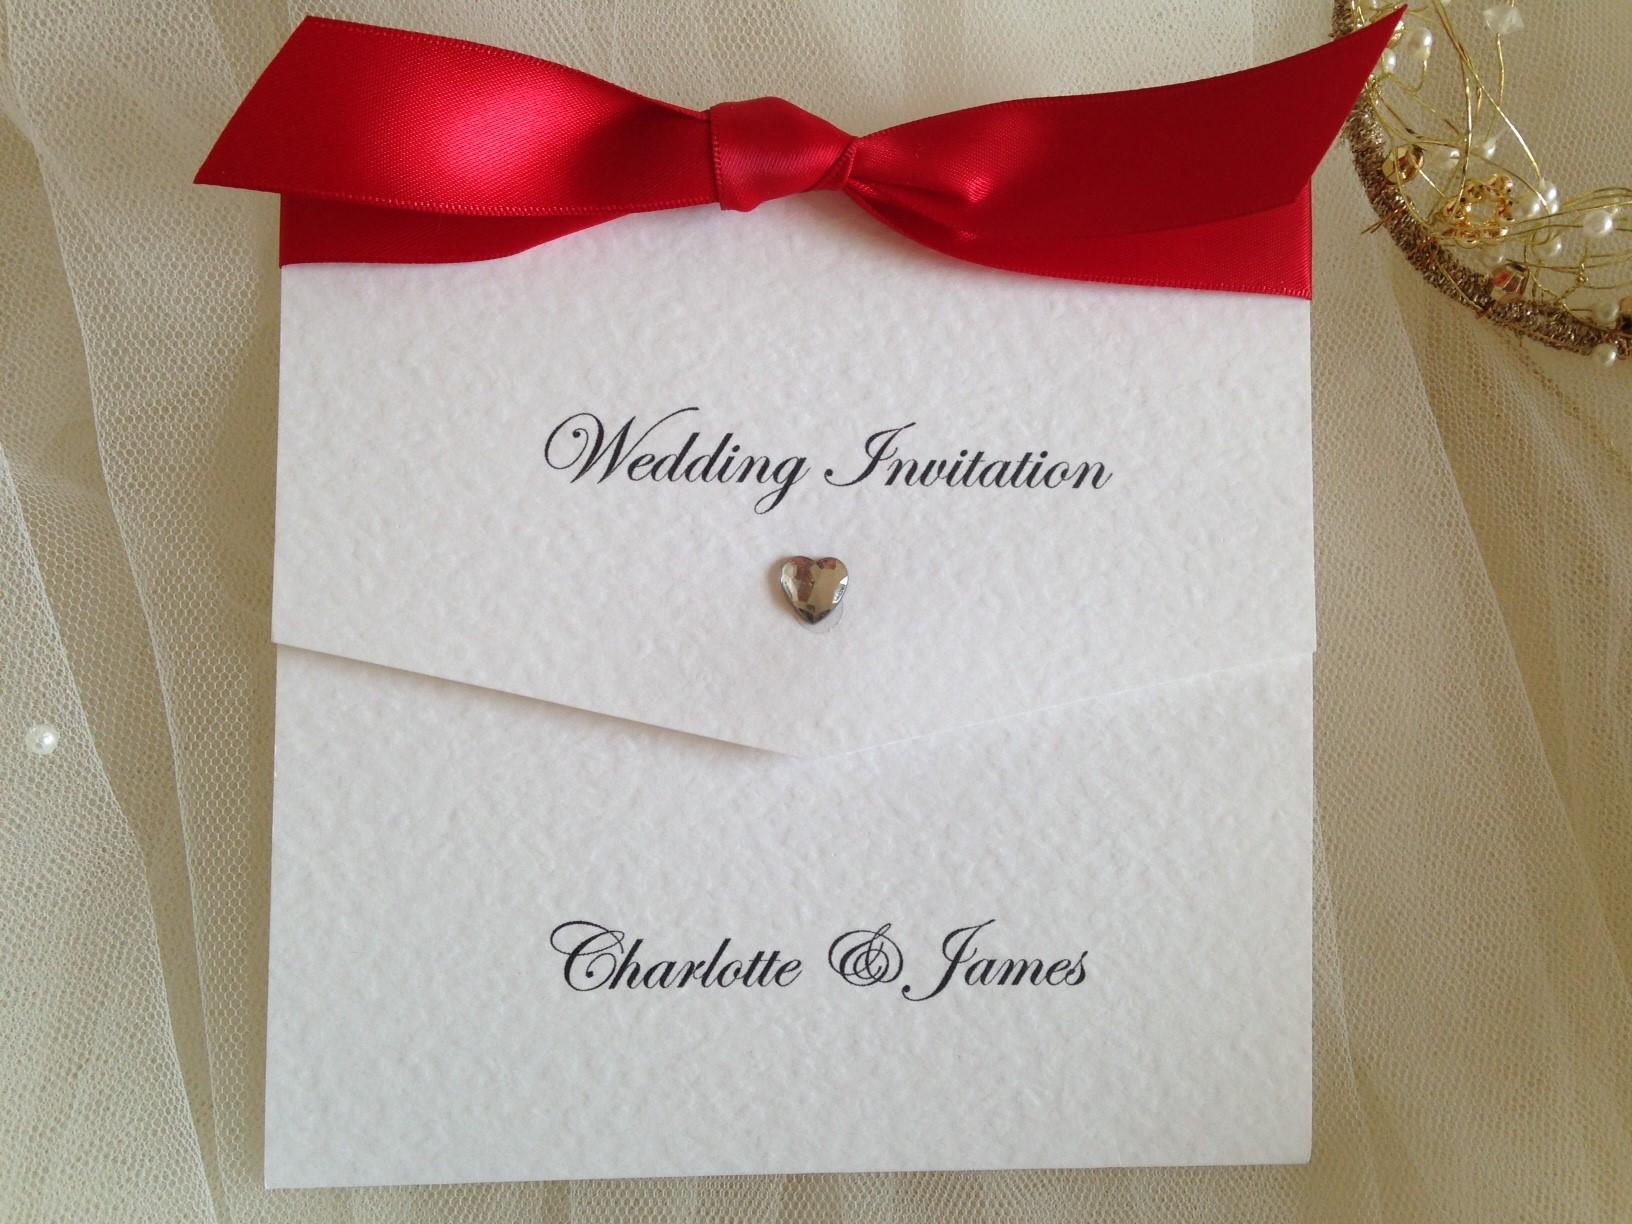 50 pcs lot tri folding wedding invitation cards with gold